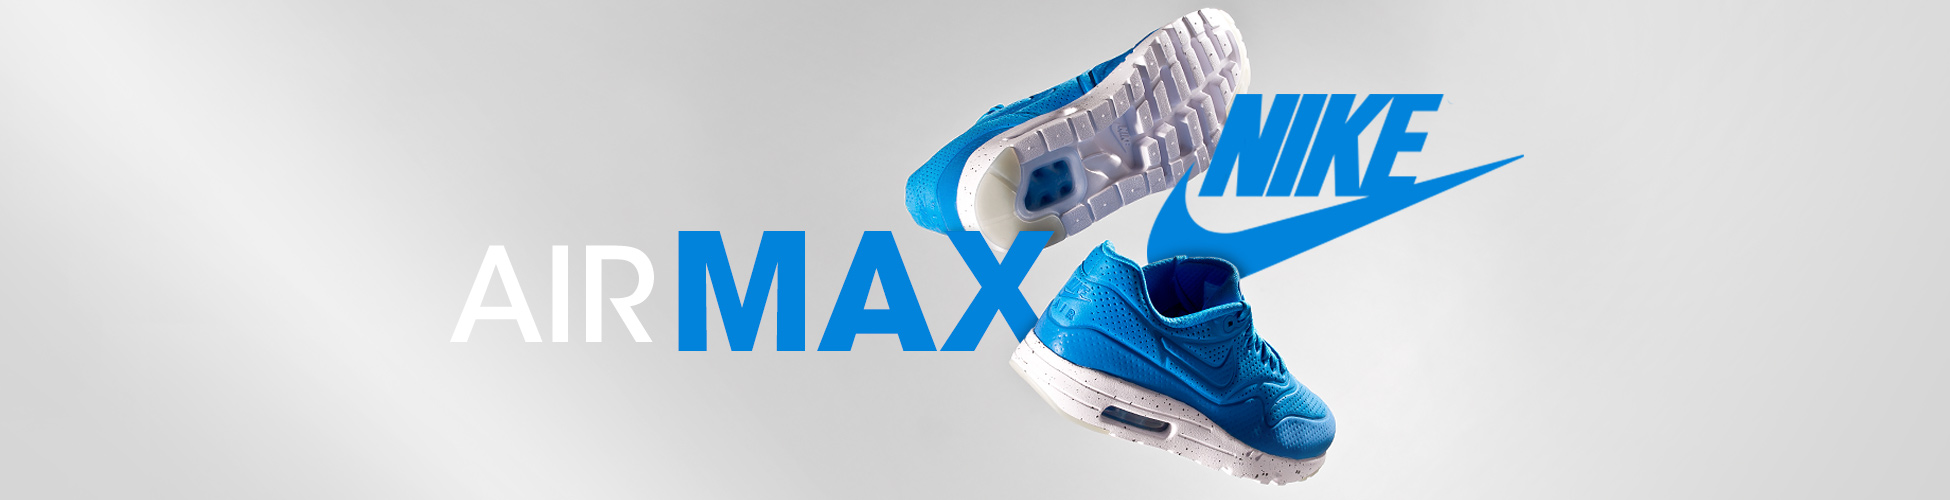 Zapatilla Nike Air Max Ultra